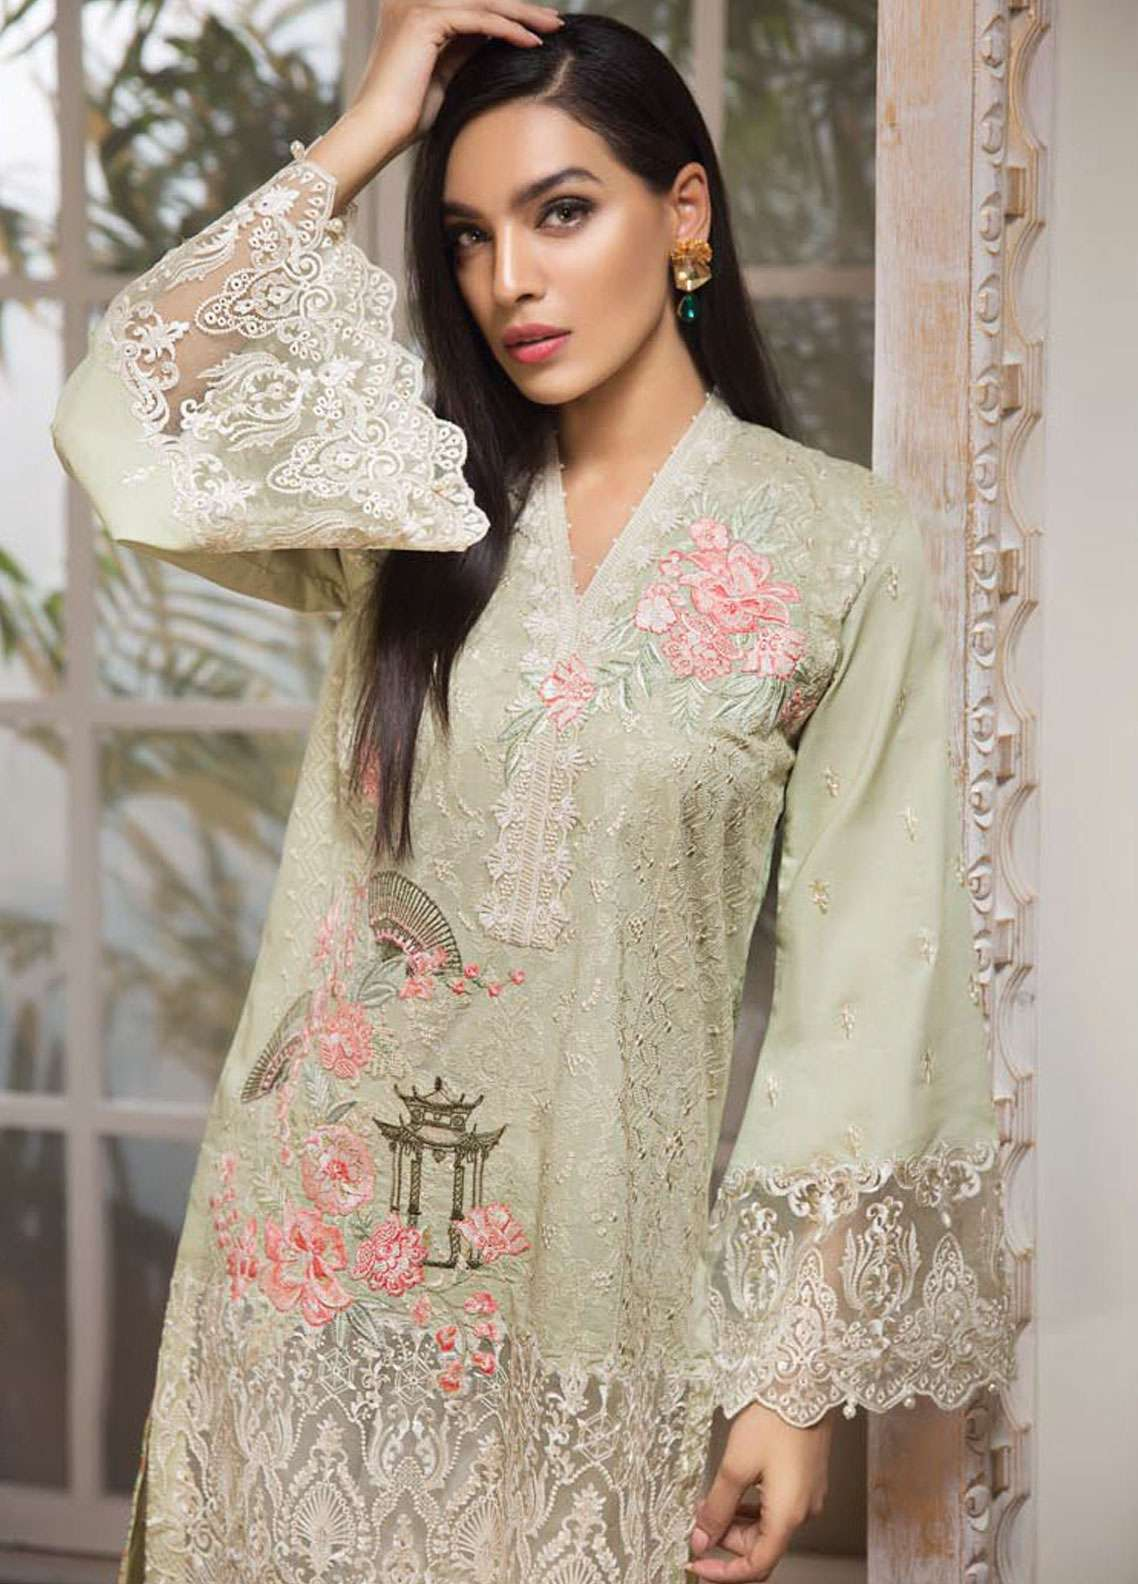 3cb7720d8e Anaya by Kiran Chaudhry Luxury Lawn 2019 Collection | Ete de L'Amour ...